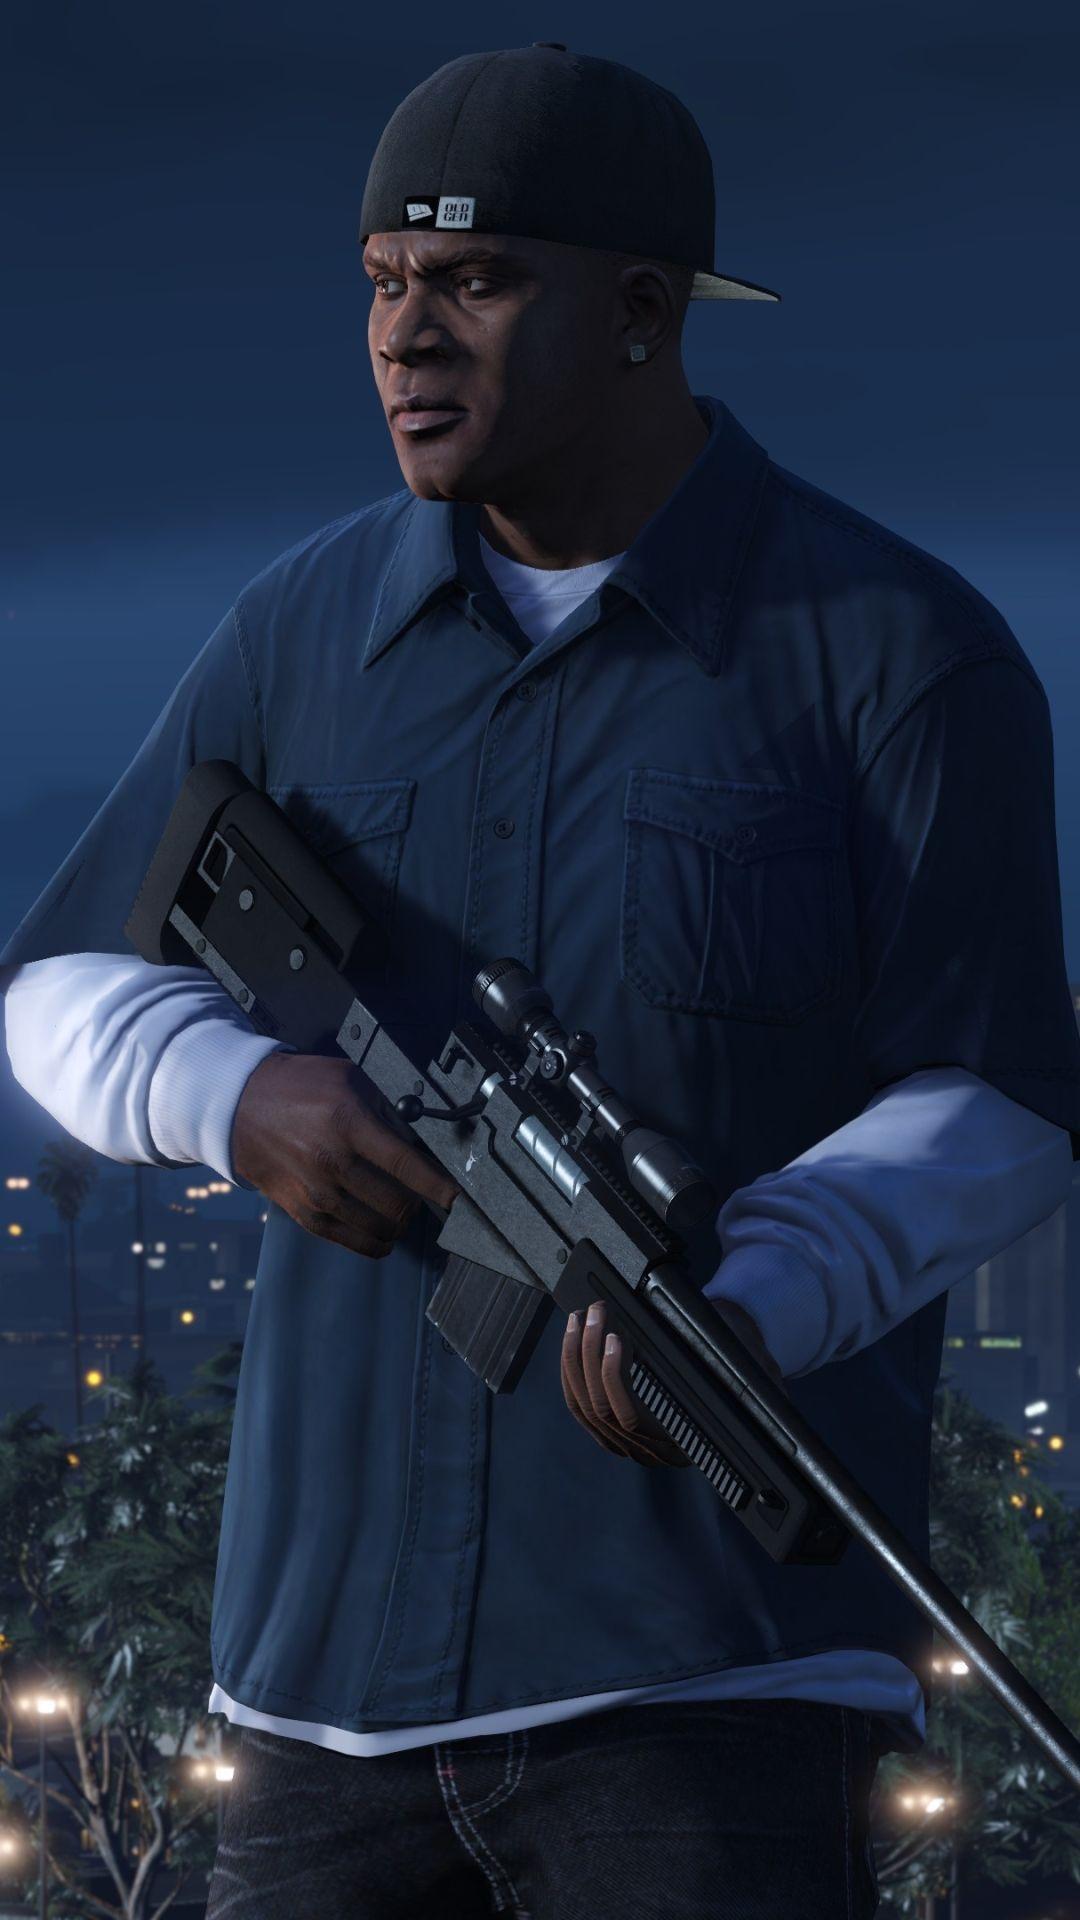 Franklin Gta V Phone Wallpaper In 2020 Gta Gta 5 Grand Theft Auto Artwork